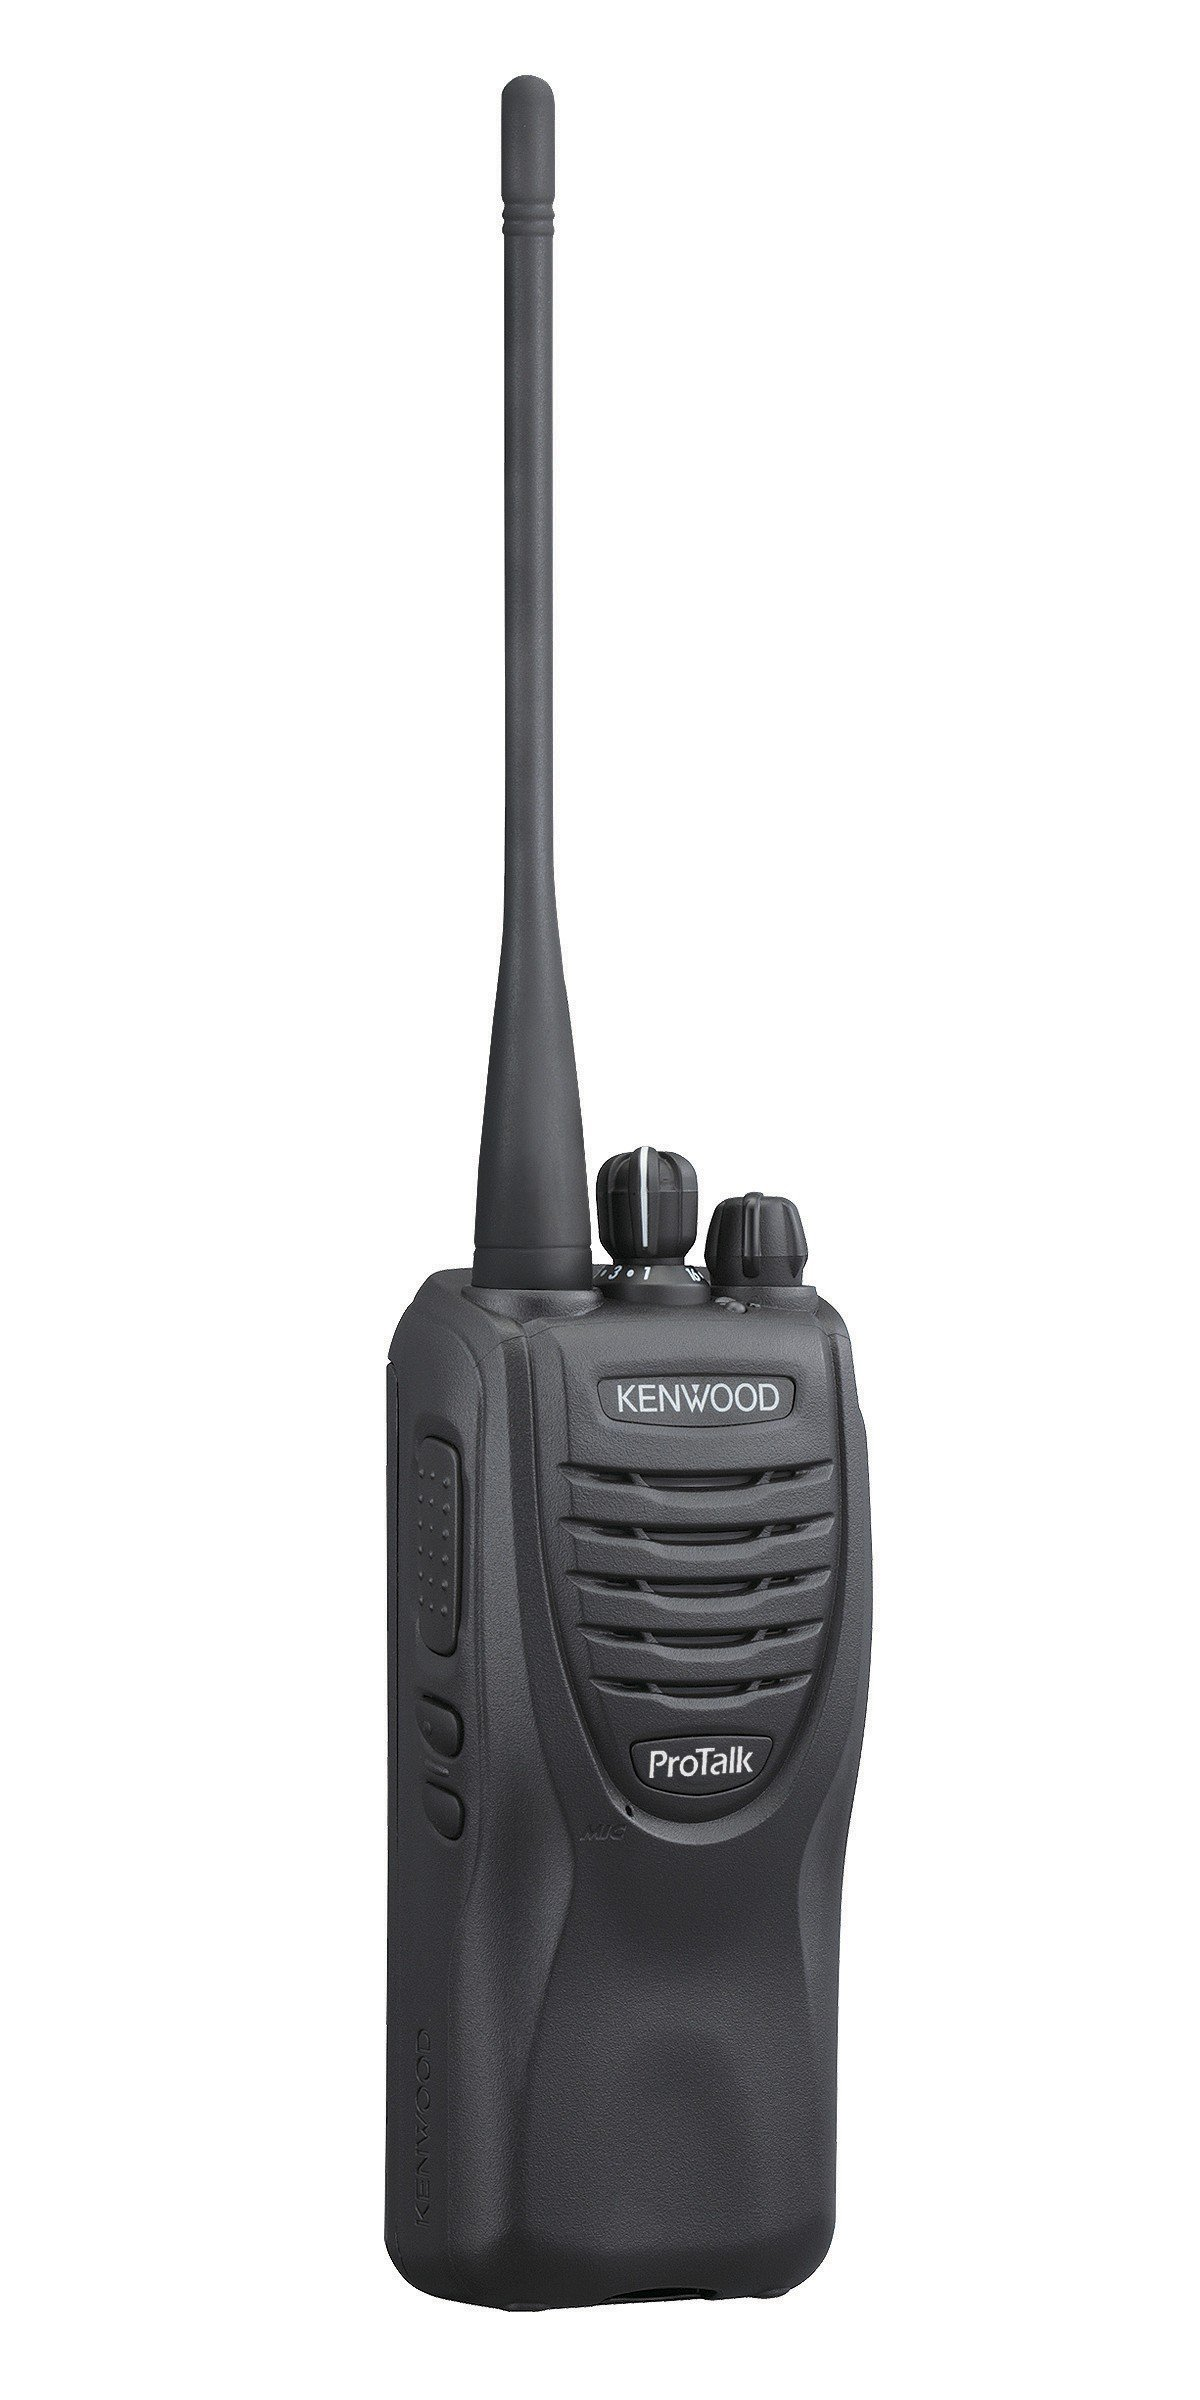 Kenwood TK-3300U16P ProTalk 2 Watt Portable VHF/UHF Business, 4 & 16 Channel VHF / UHF Models, 89 UHF Pre-Programmed Frequencies, 27 VHF Pre-Programmed Frequencies, QT/DQT Encode/Decode, Wireless Cloning, Audio Companding, Channel Confirmation Mode, Scan